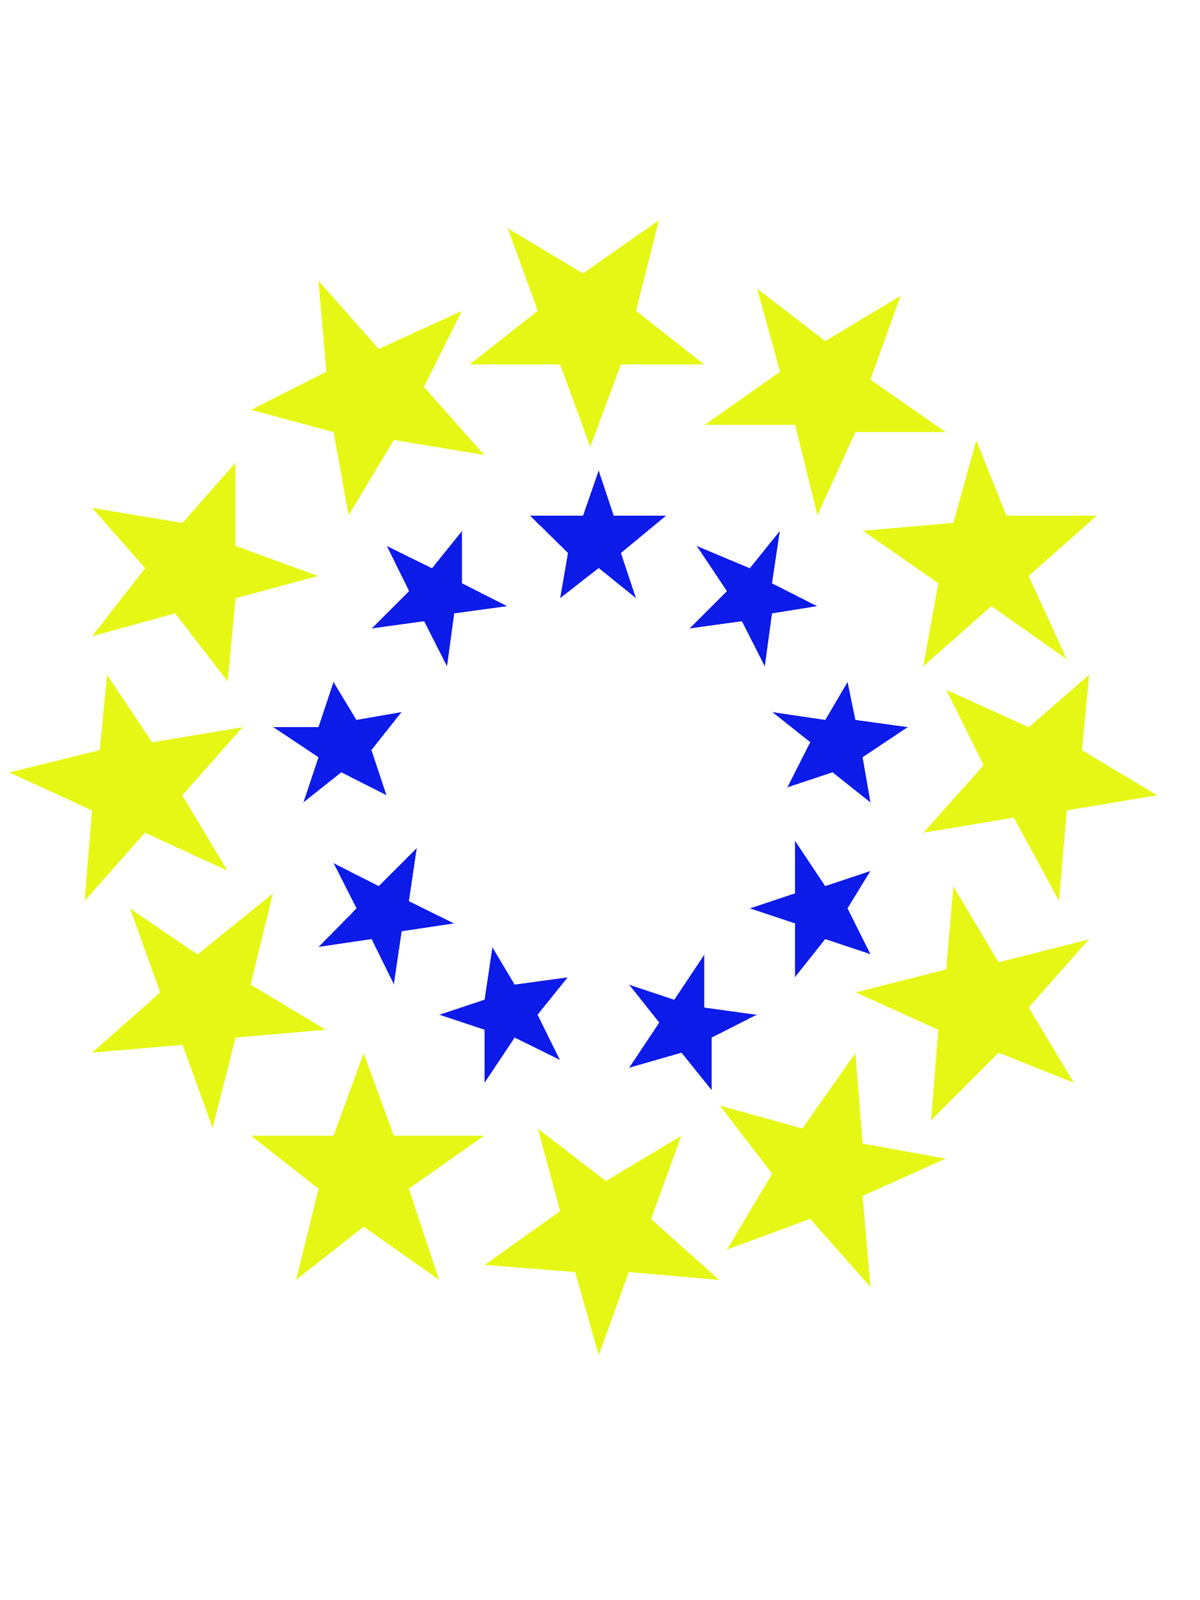 bilsp logo